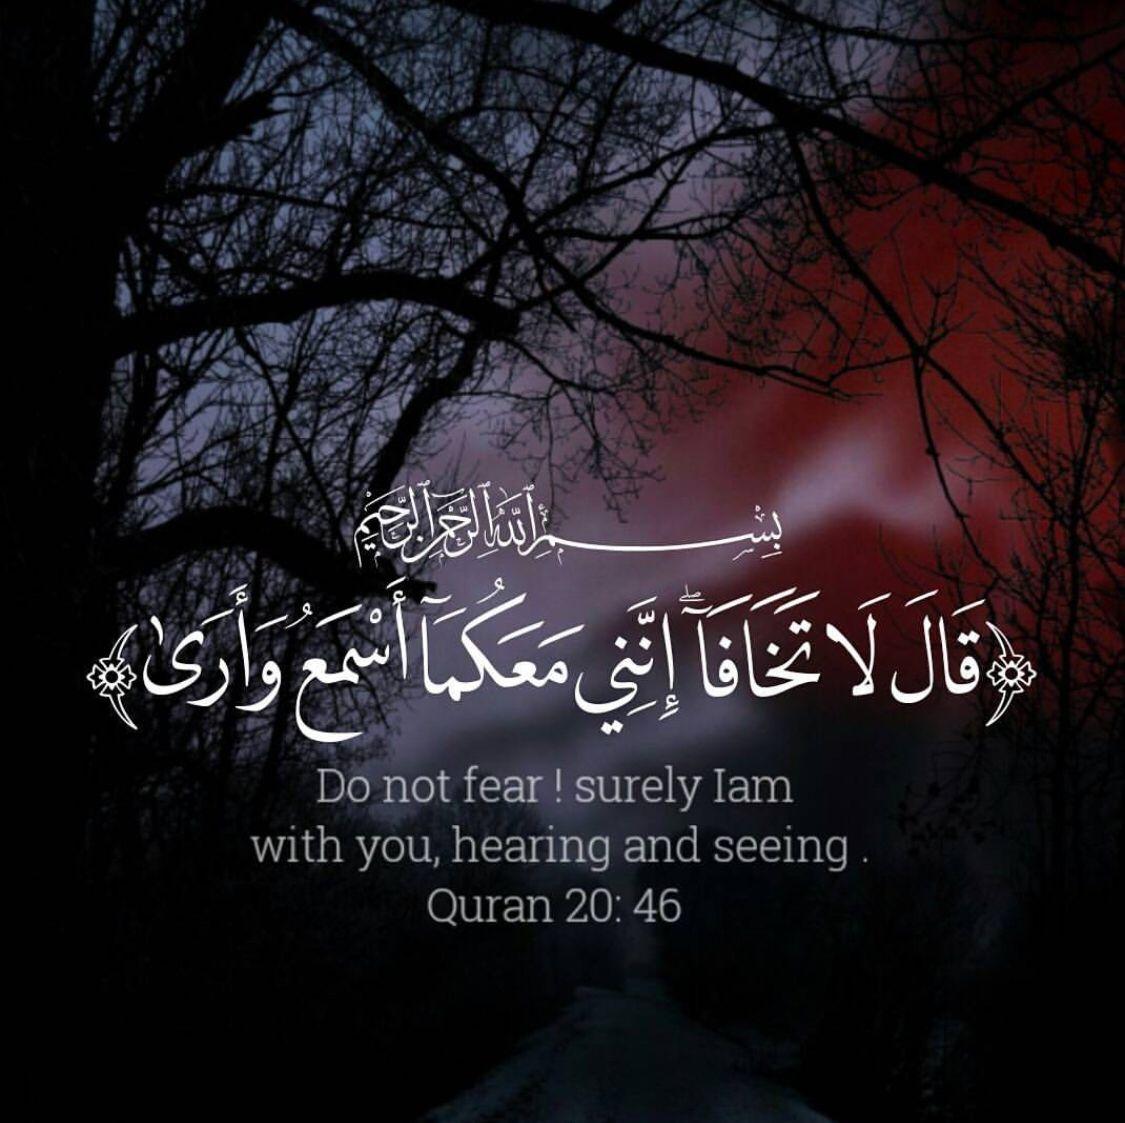 Pin By صورة و كلمة On وقفة مع آية Quran Quotes Beautiful Quran Quotes Quran